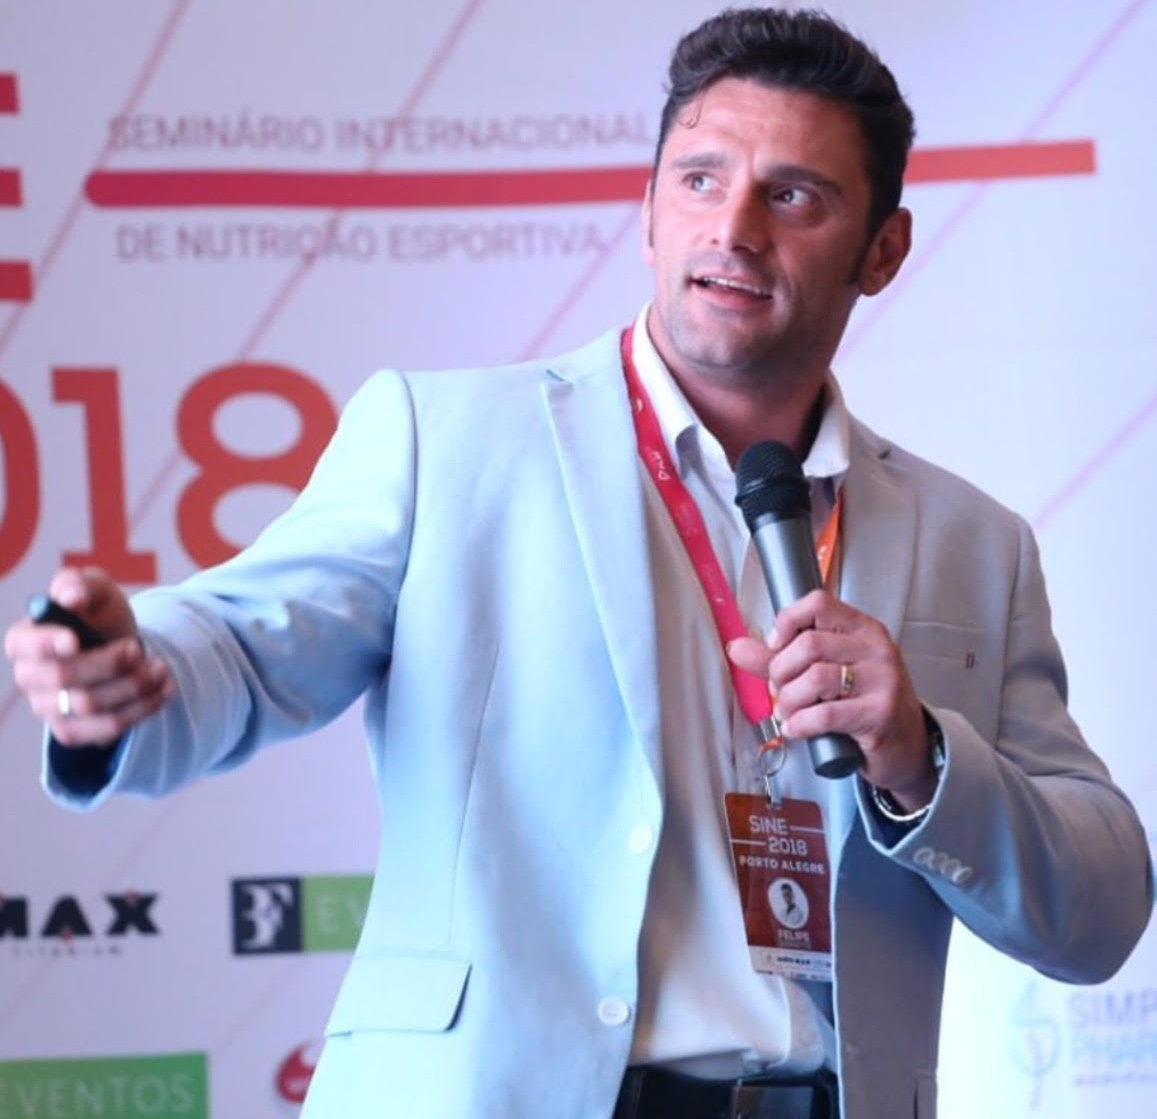 Felipe Donatto - Nutricionista Esportivo